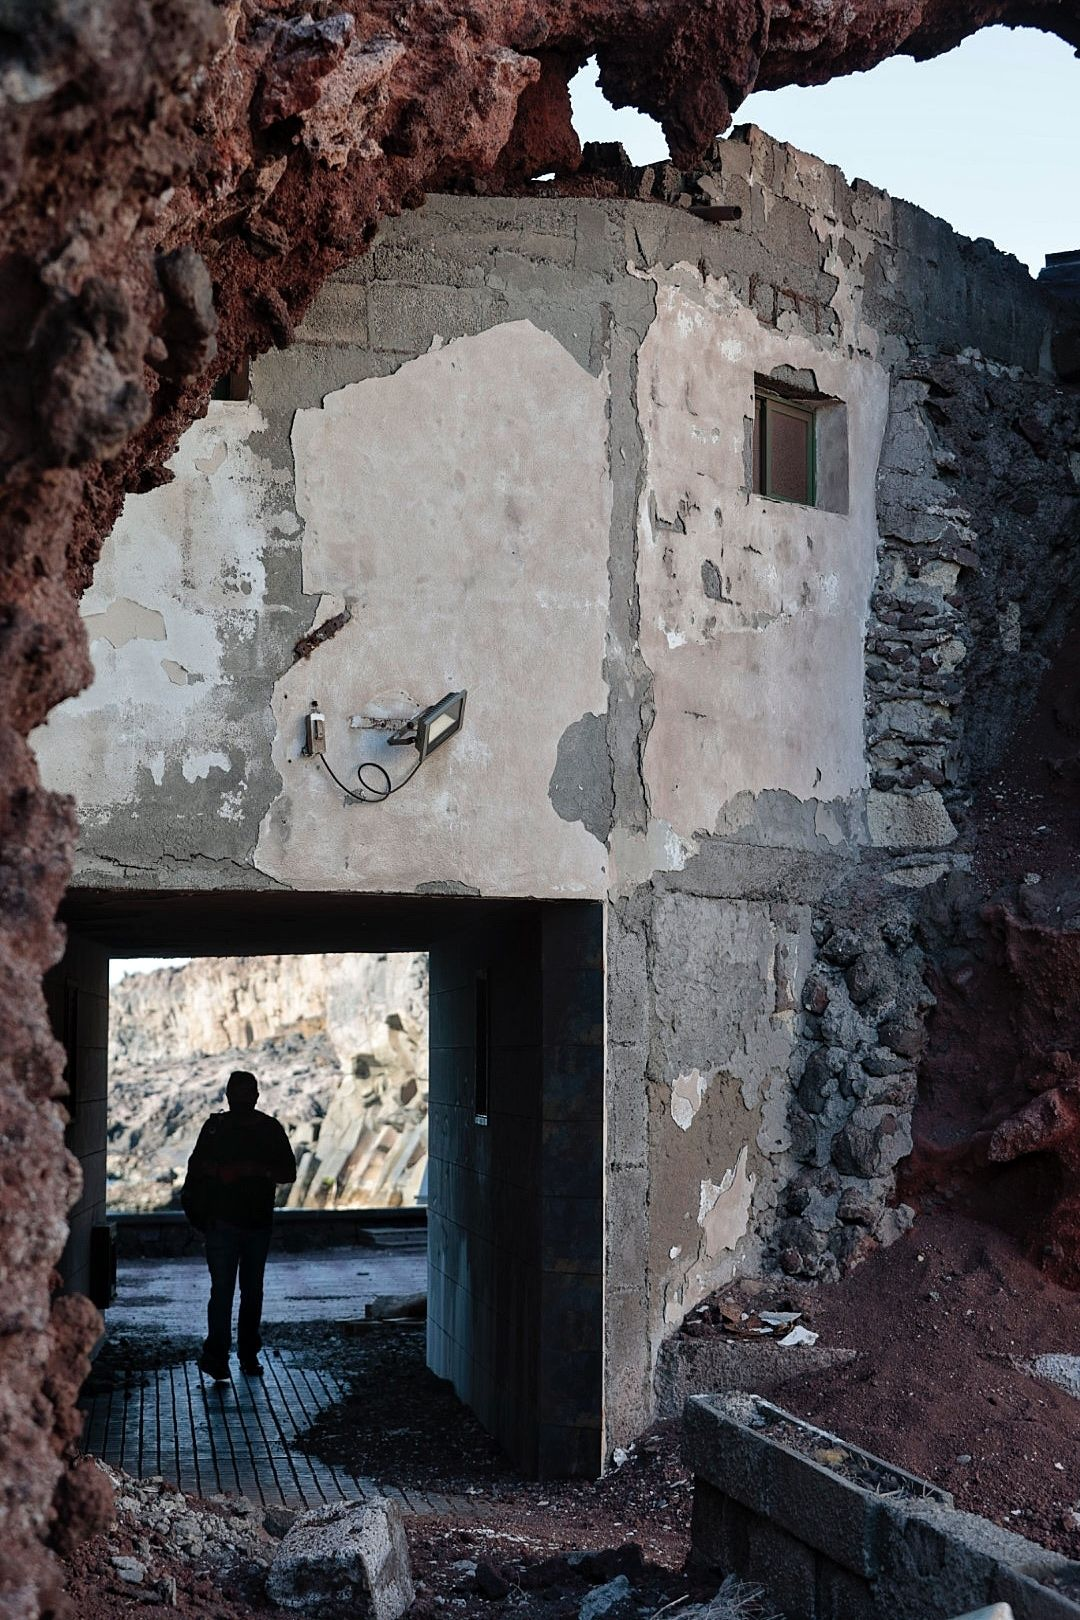 Visita de Pedro Martín a Los Roques de Fasnia